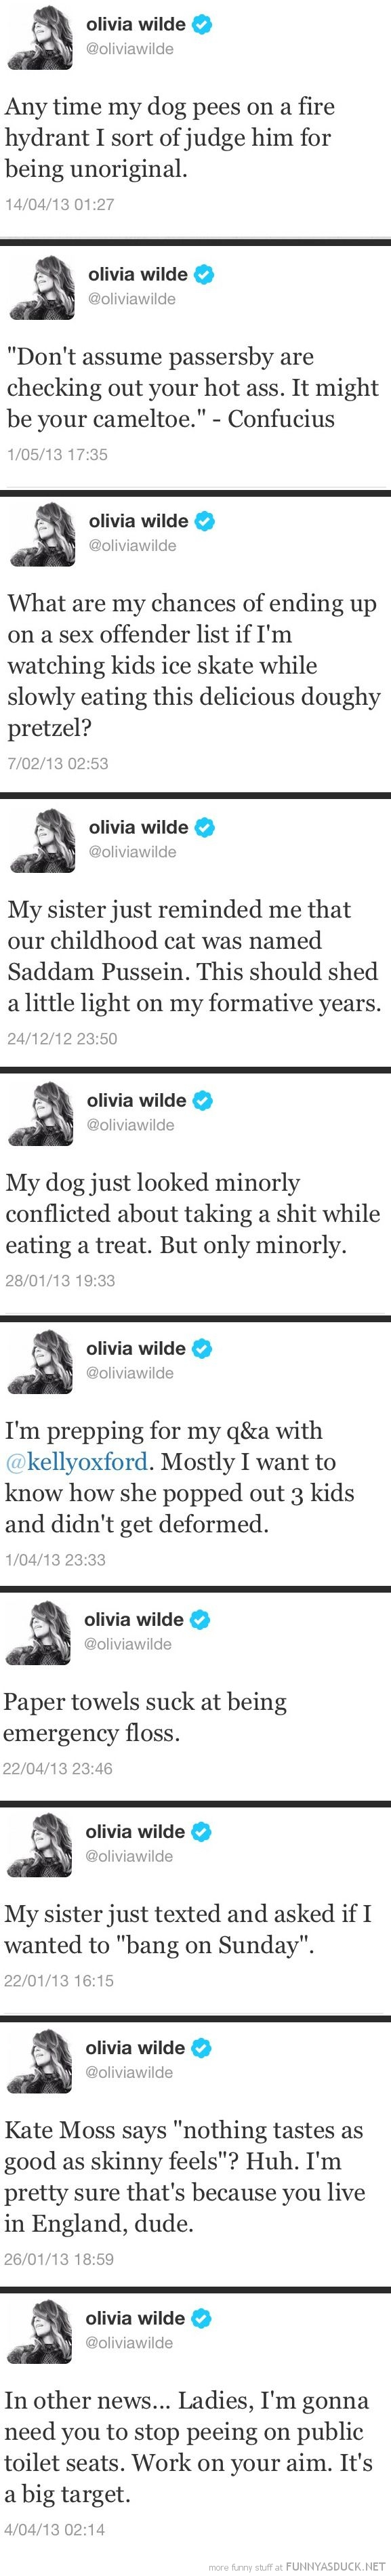 Olivia Wilde Tweets